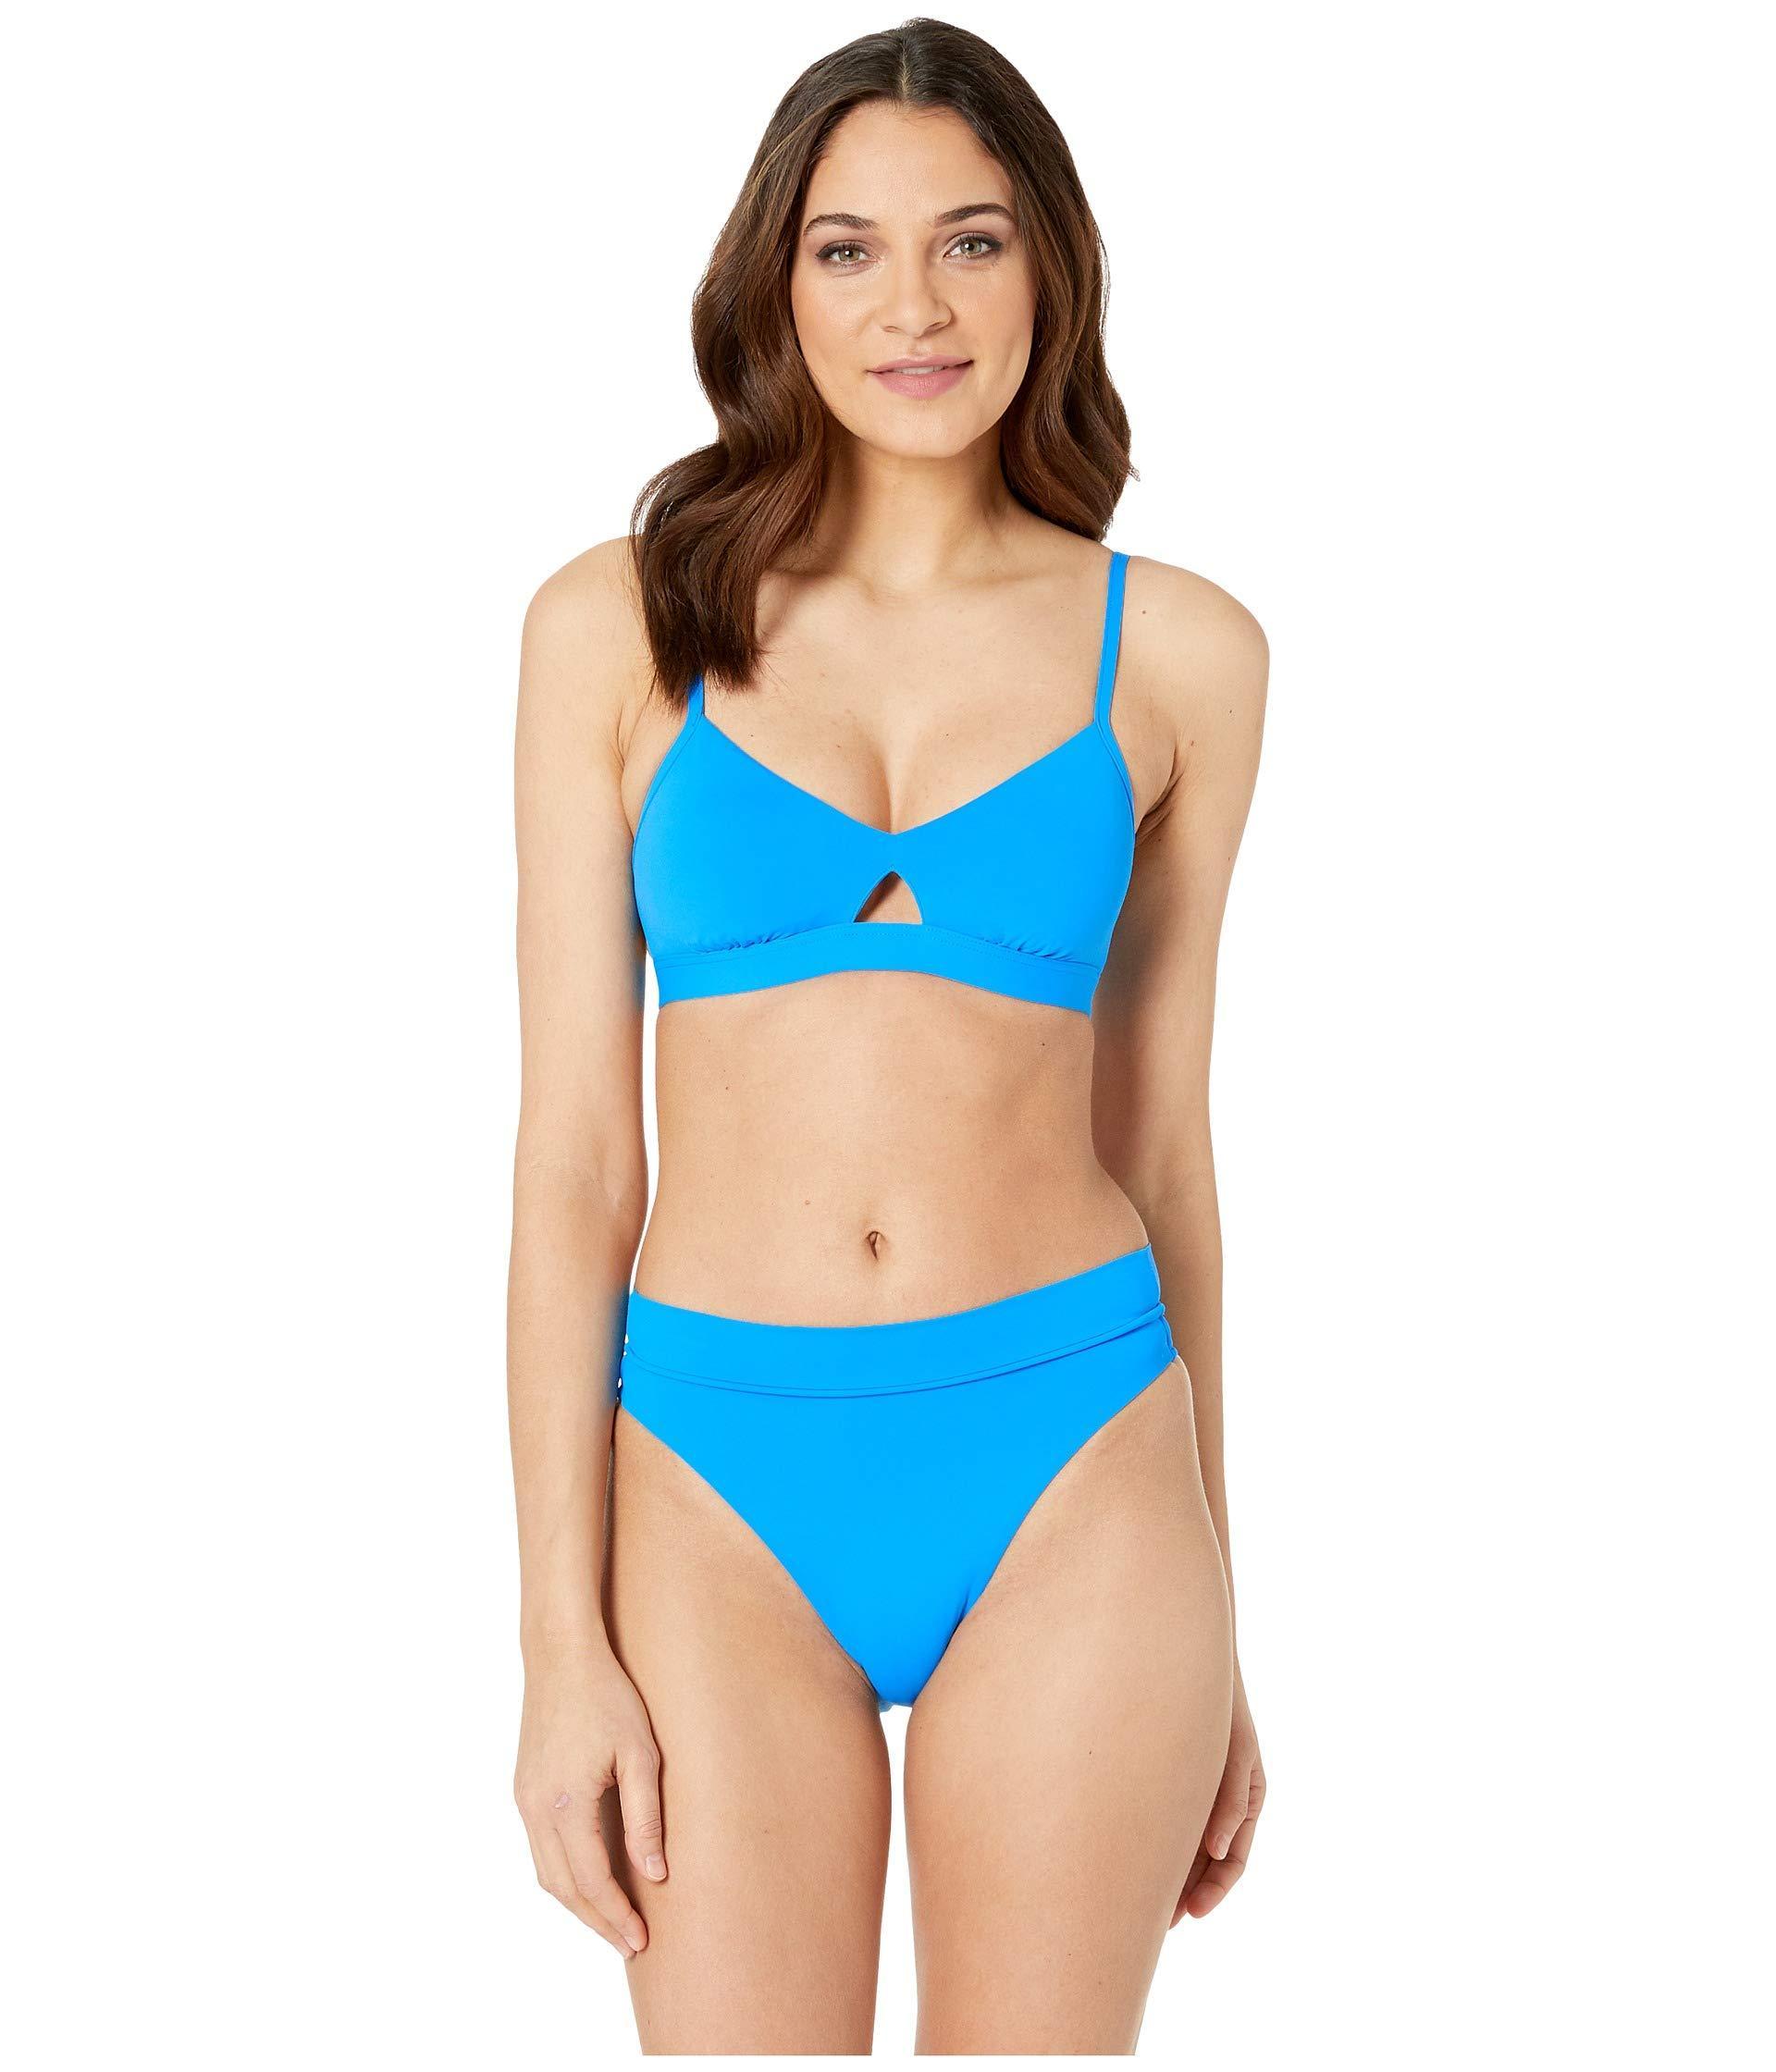 c6a9f47a023 Seafolly - Blue Active Hybrid Bralette Top (buttercup) Women s Swimwear -  Lyst. View fullscreen